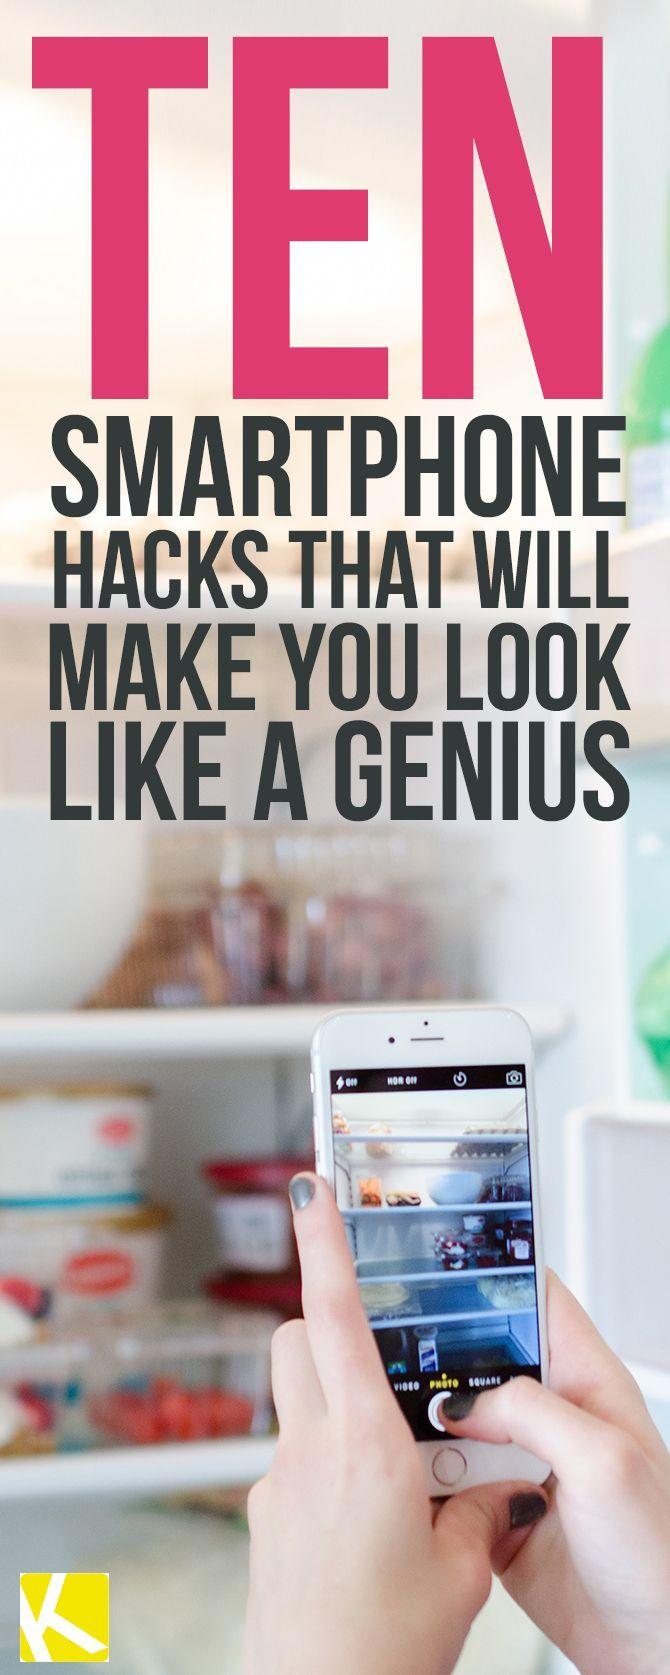 10 genius smartphone hacks that will change your life hacks life hacks und praktisch. Black Bedroom Furniture Sets. Home Design Ideas